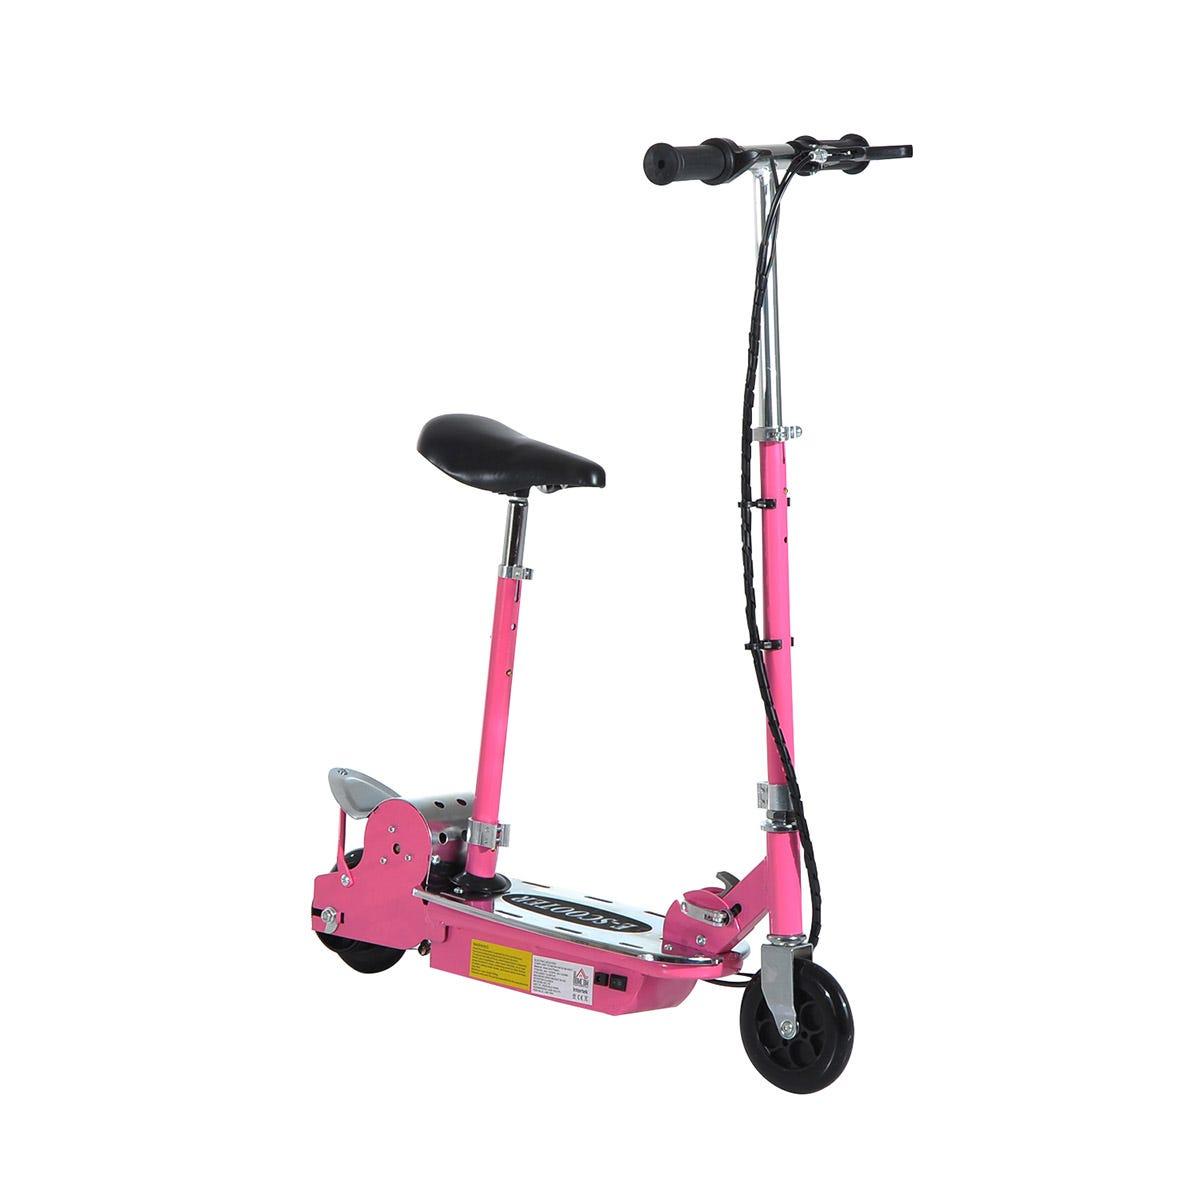 Reiten Teen Foldable E-Scooter Electric Battery 12V 120W w/ Brake Kickstand - Pink